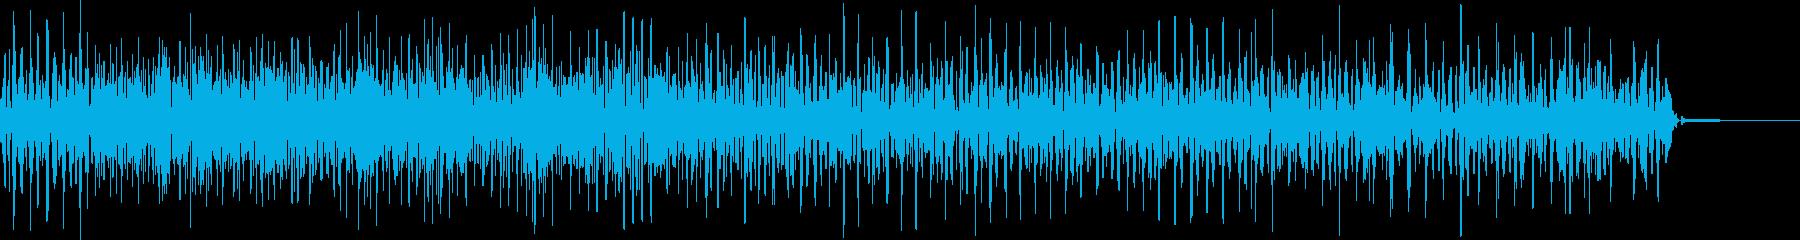 AMGアナログFX23の再生済みの波形